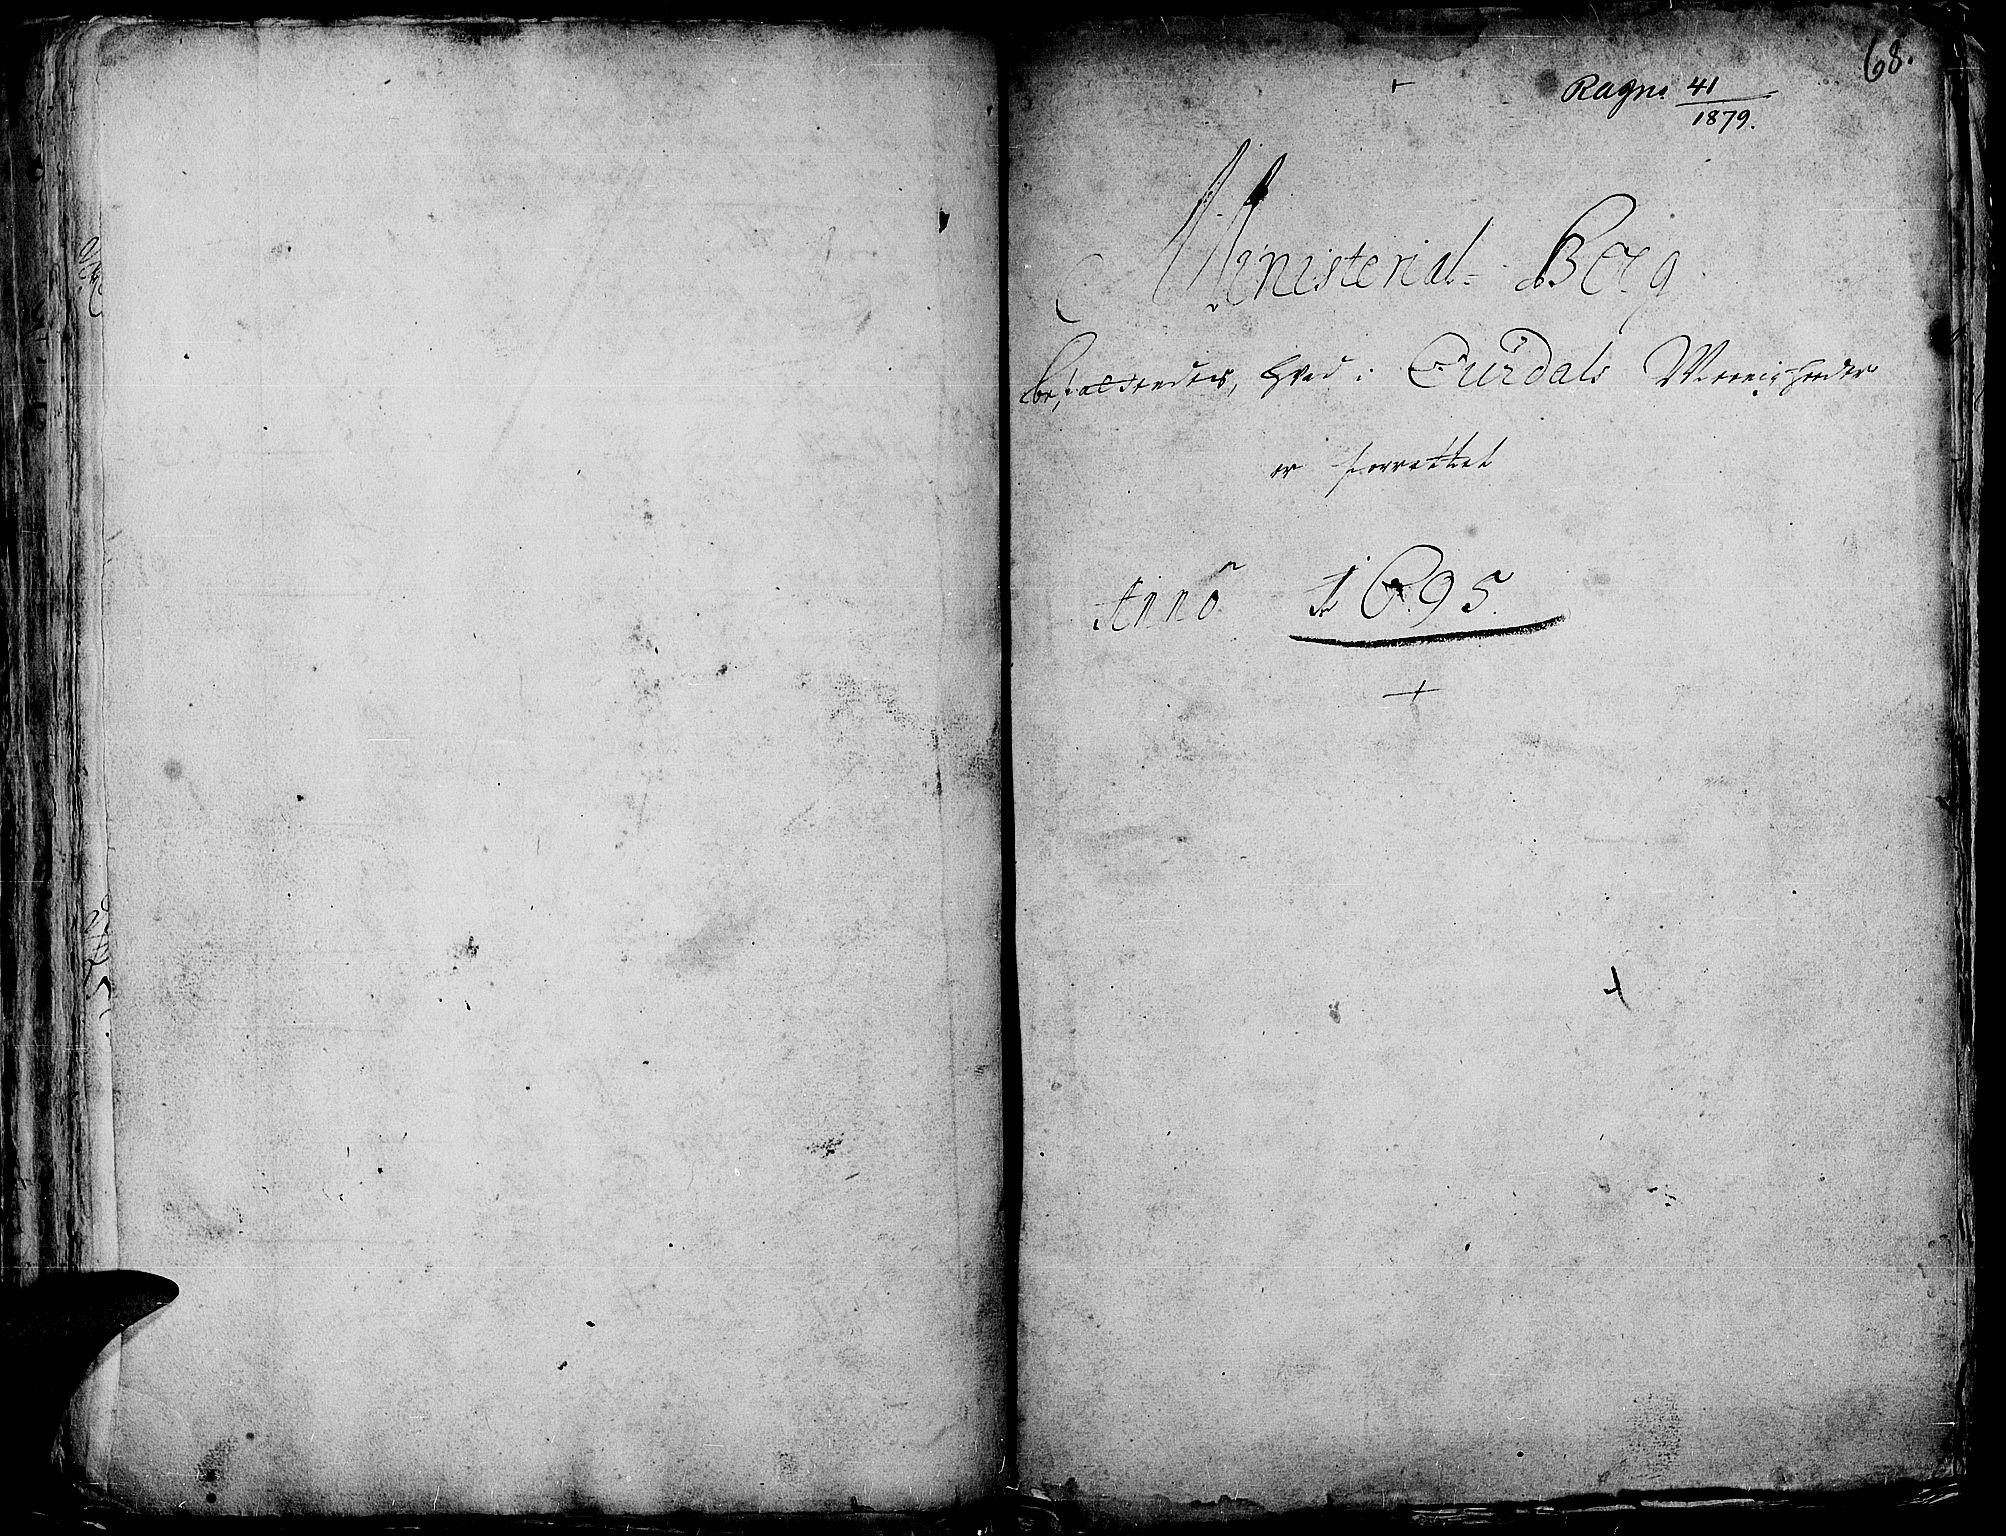 SAH, Aurdal prestekontor, Ministerialbok nr. 1-3, 1692-1730, s. 68